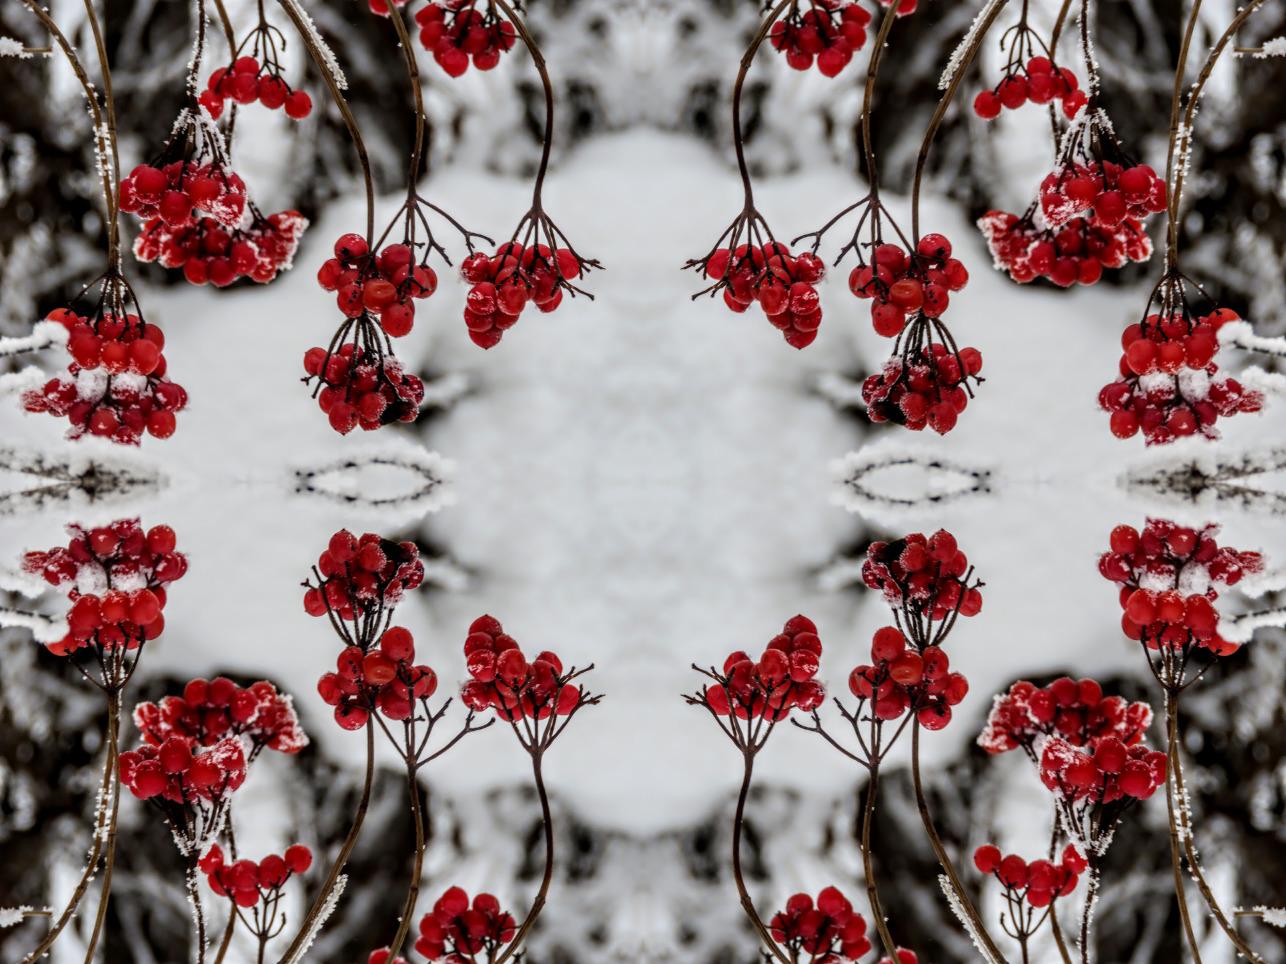 imgonline com ua mirror collage 64LCrPGtbcC5